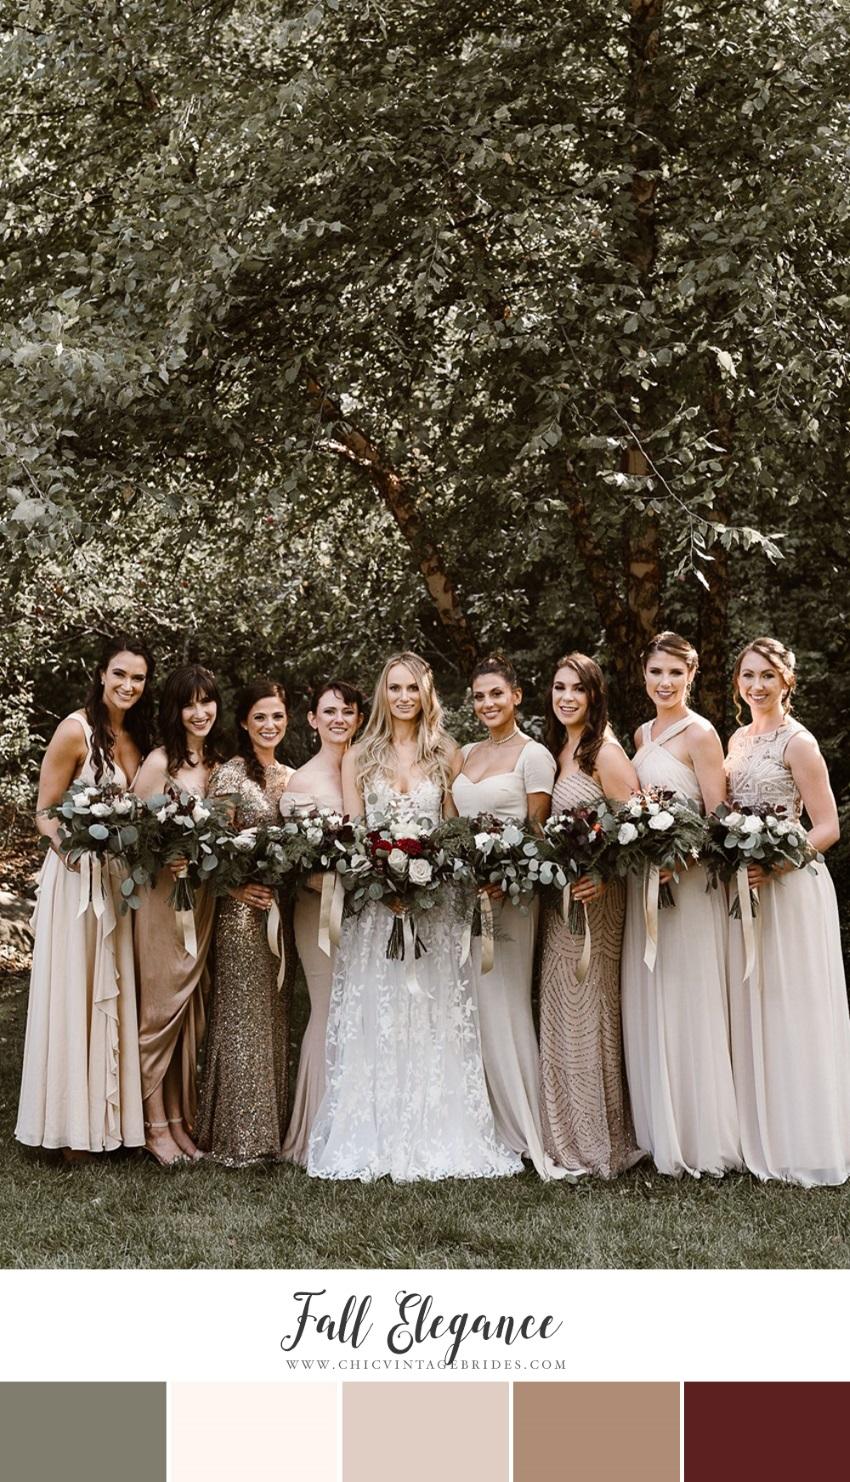 Neutrals & Scarlett Fall Wedding Colour Palette